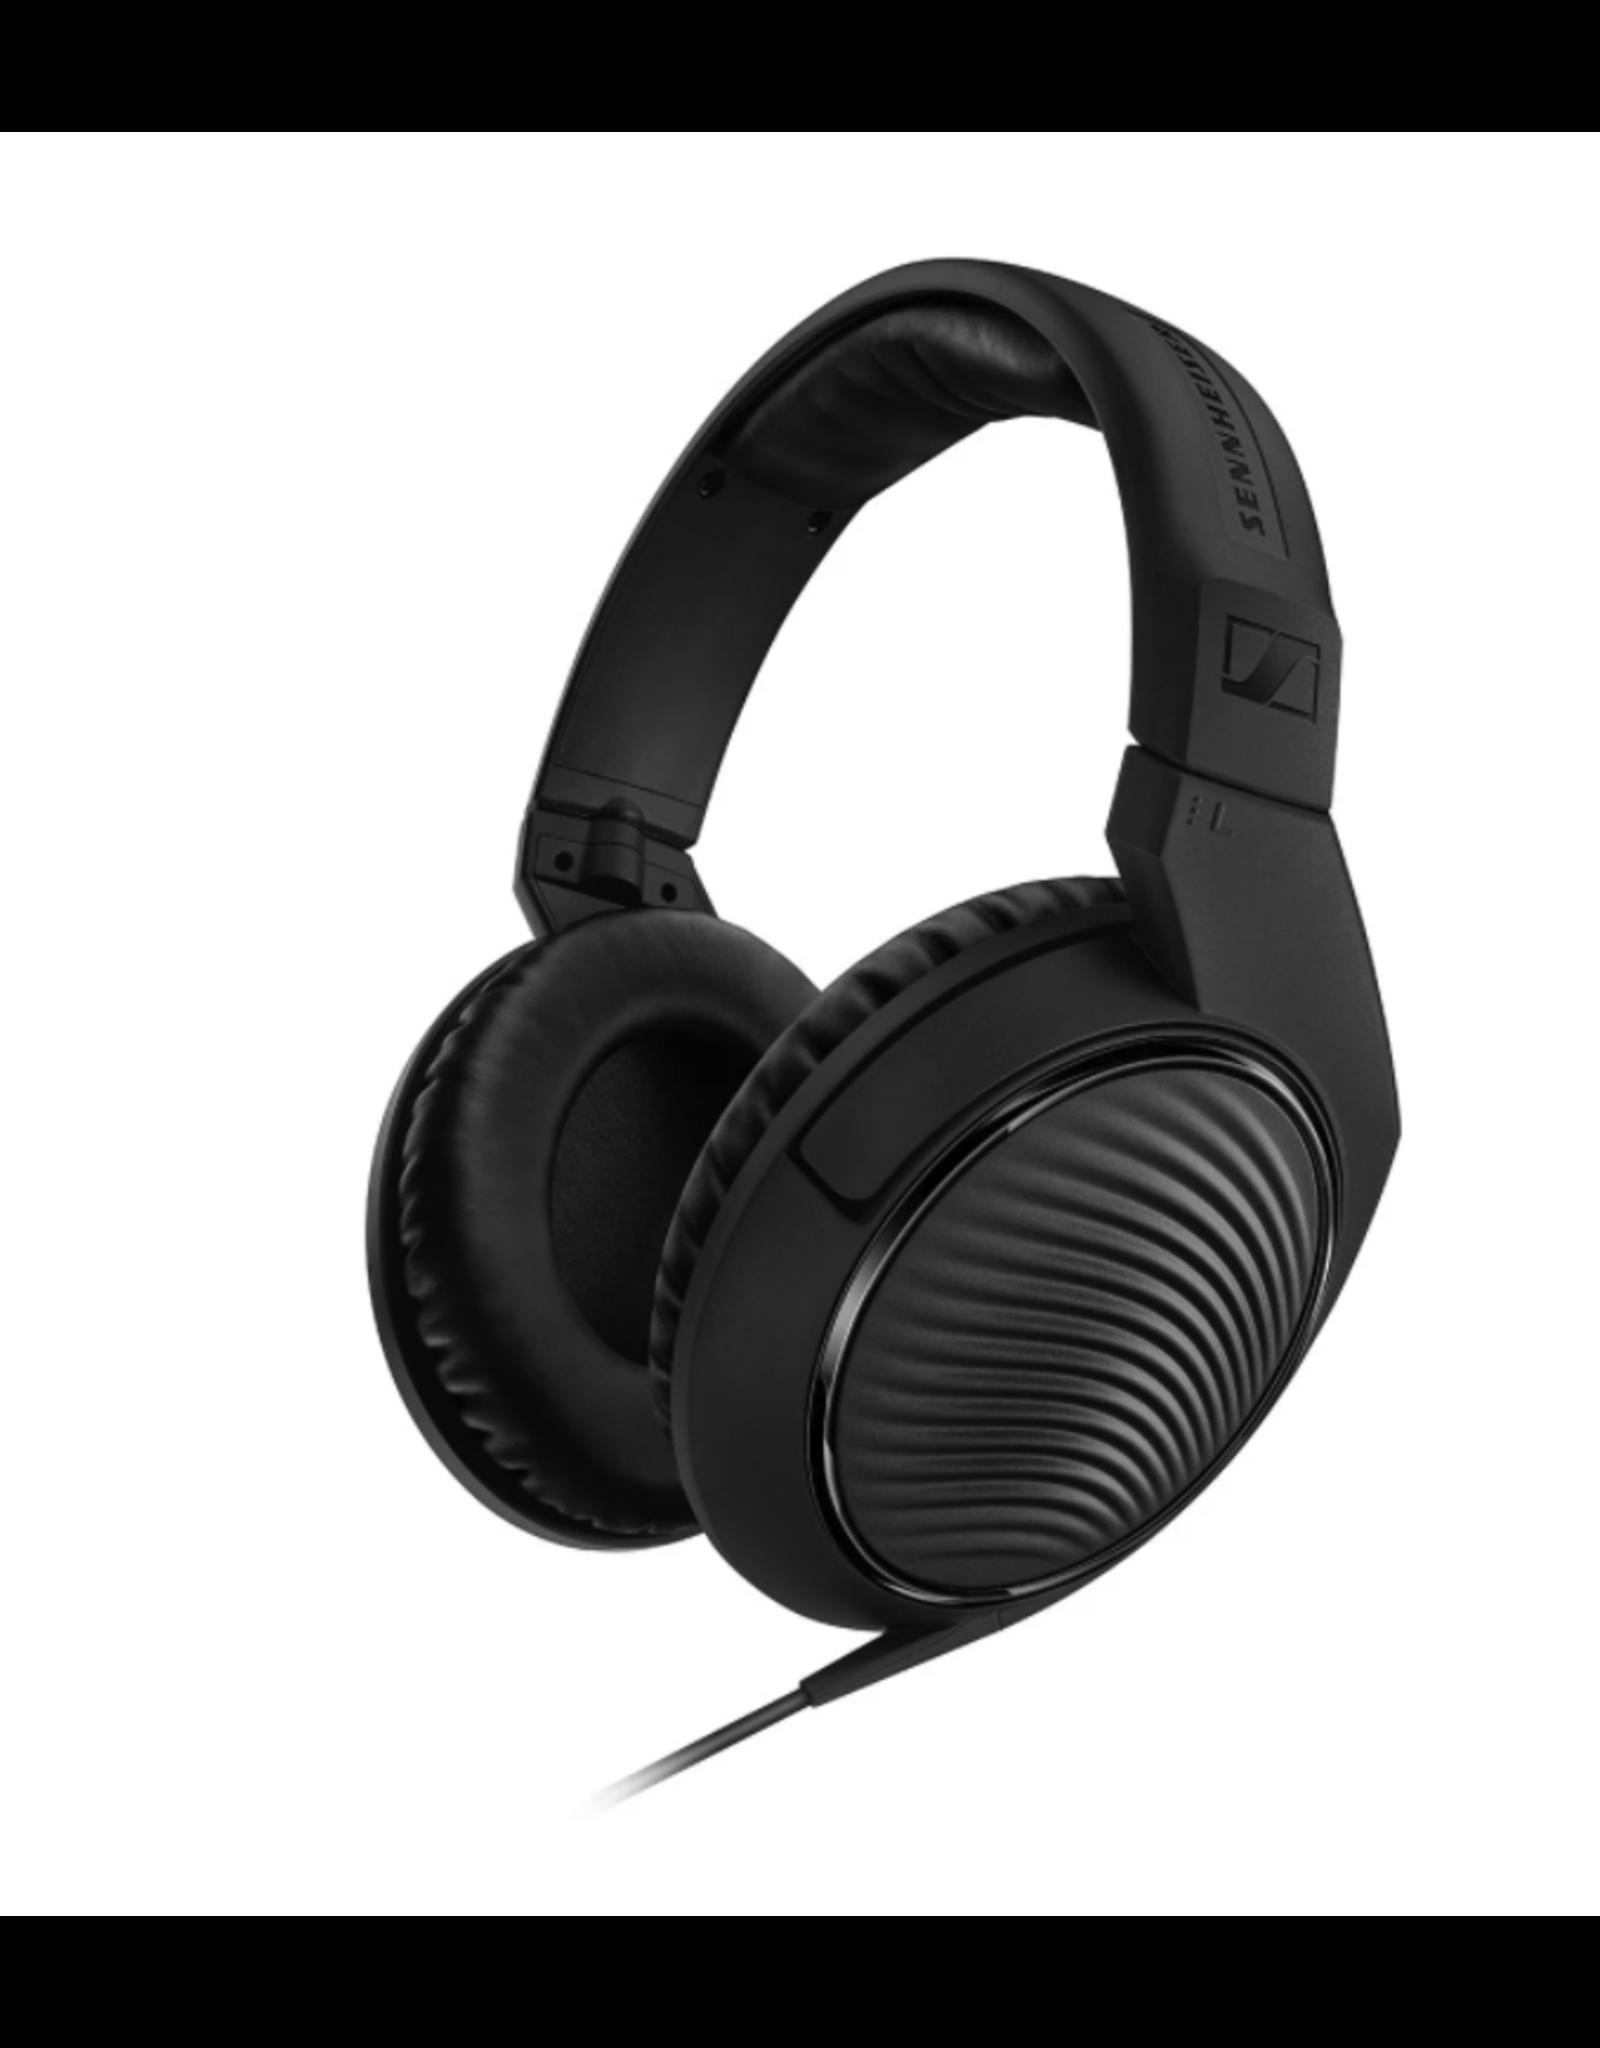 Sennheiser Sennheiser HD 200 PRO Studio Headphones